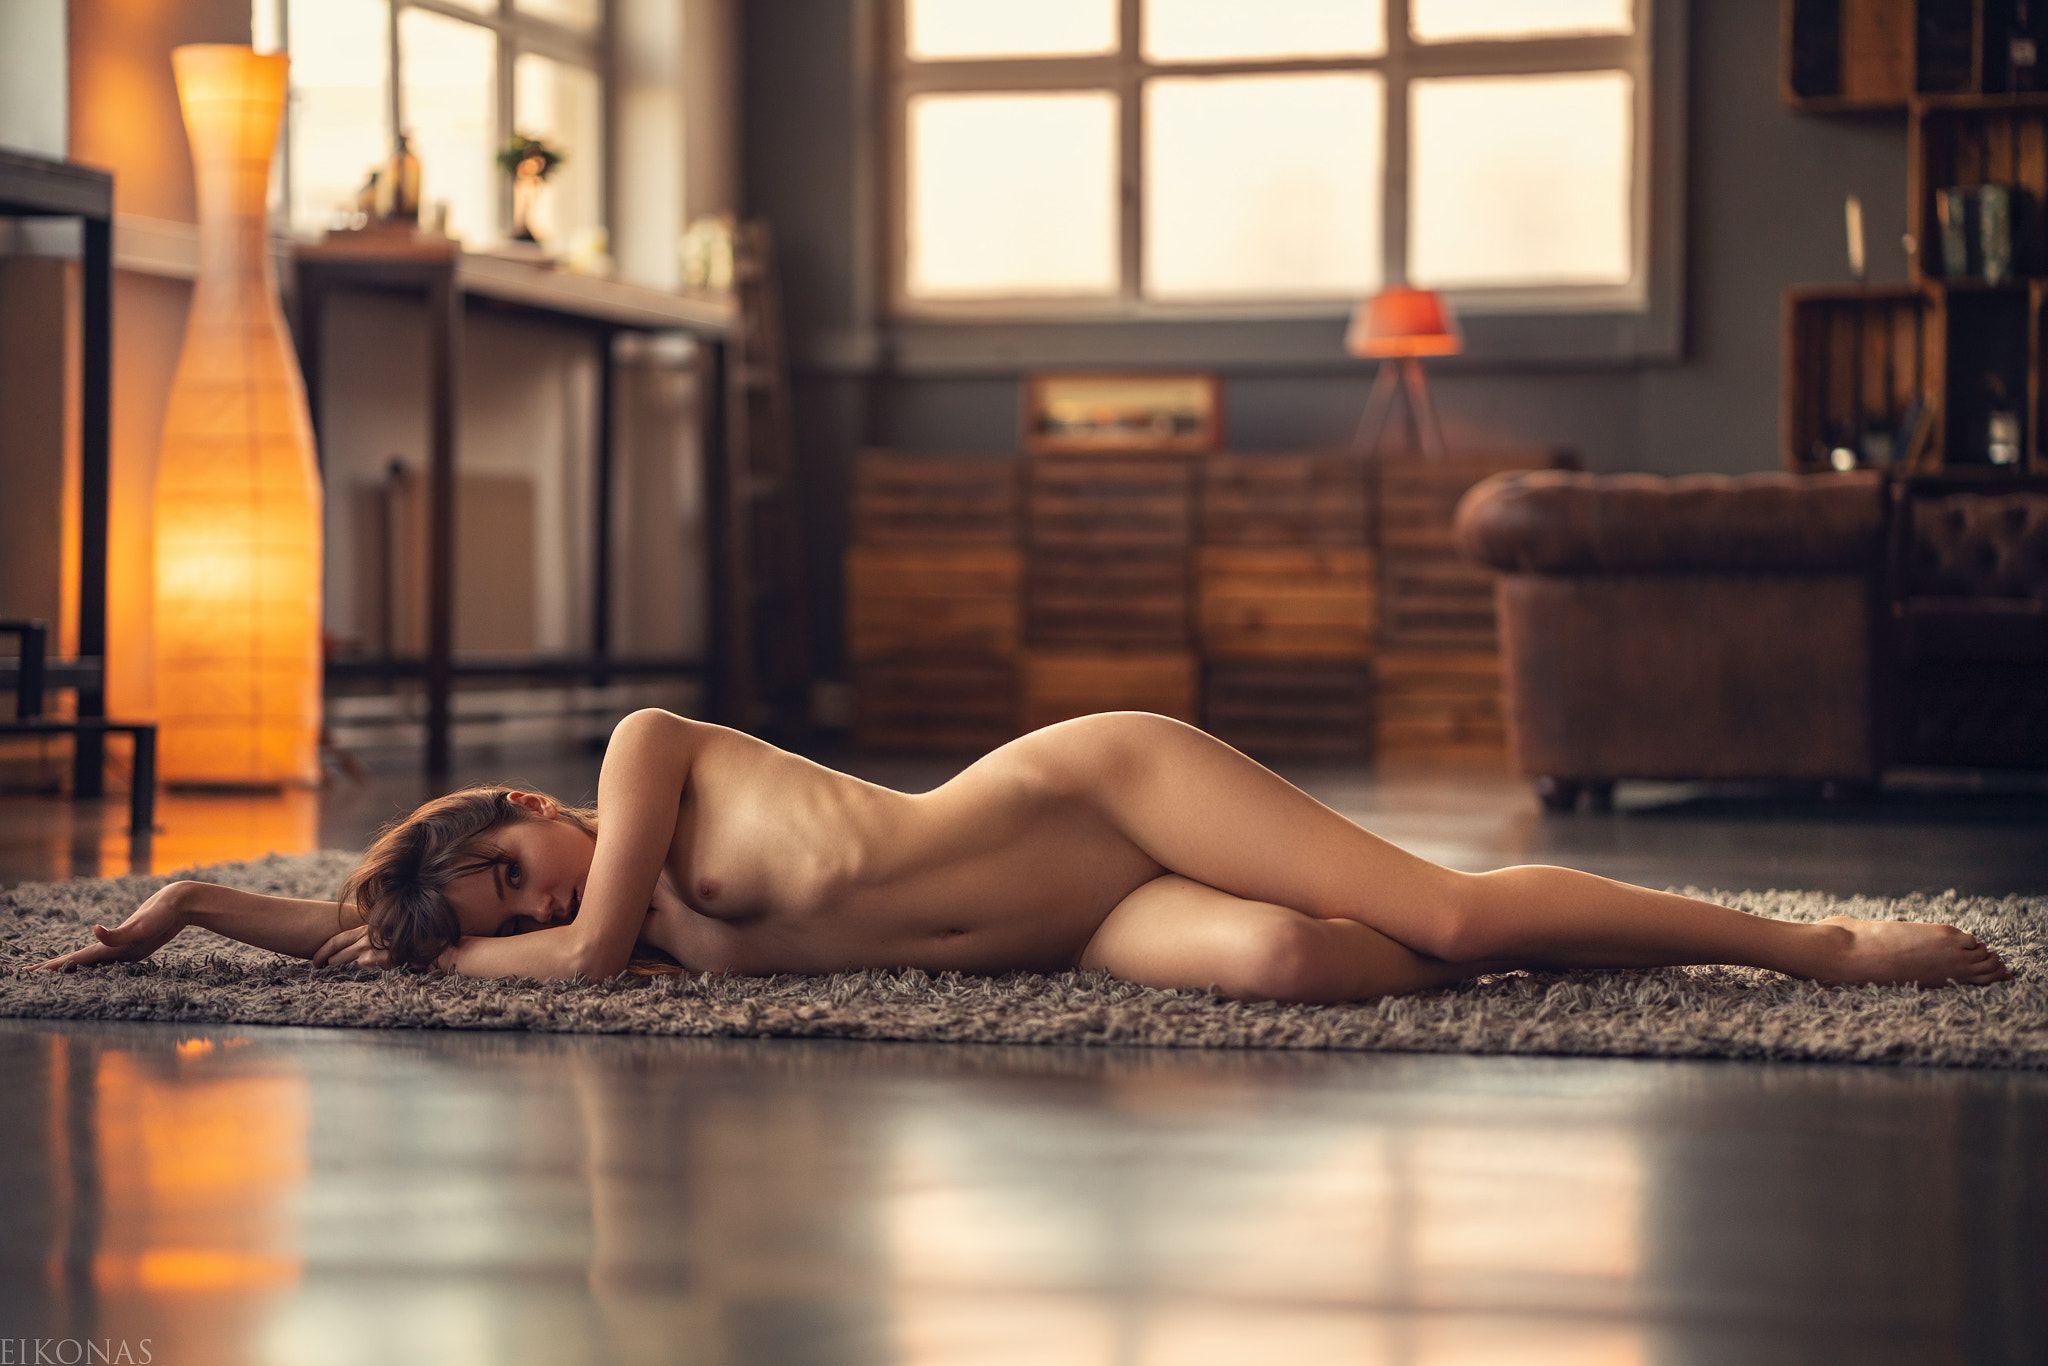 Alison brie full frontal nude scenes